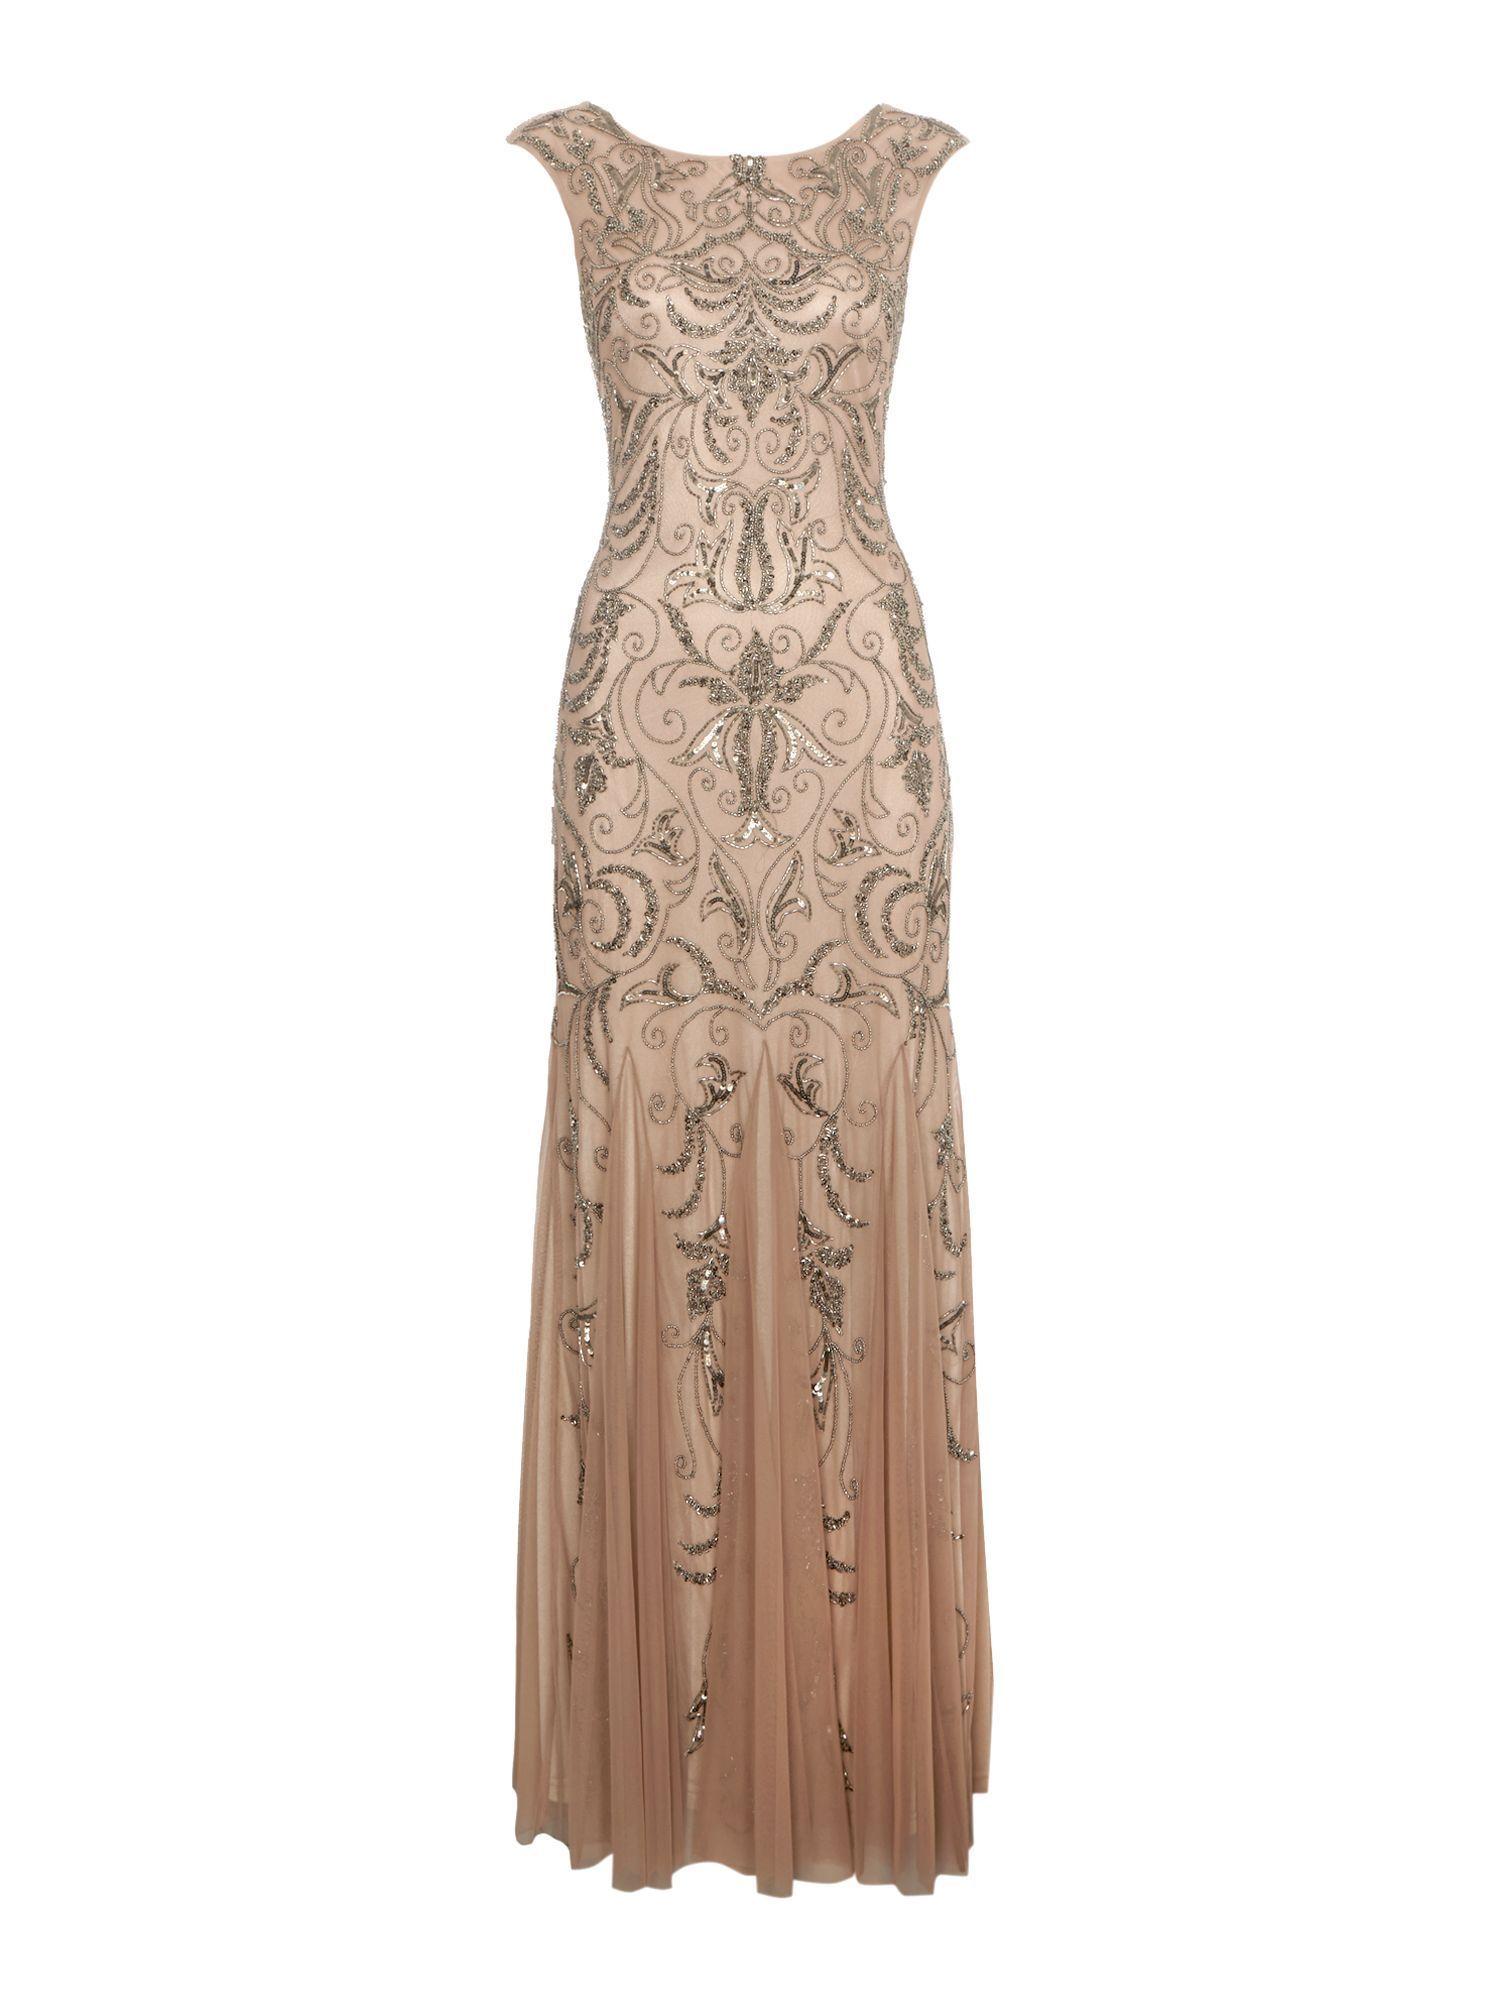 1920s Dresses Uk Flapper Gatsby Downton Abbey Dress 1920s Fashion Dresses 1920s Fashion Flapper Dress Uk